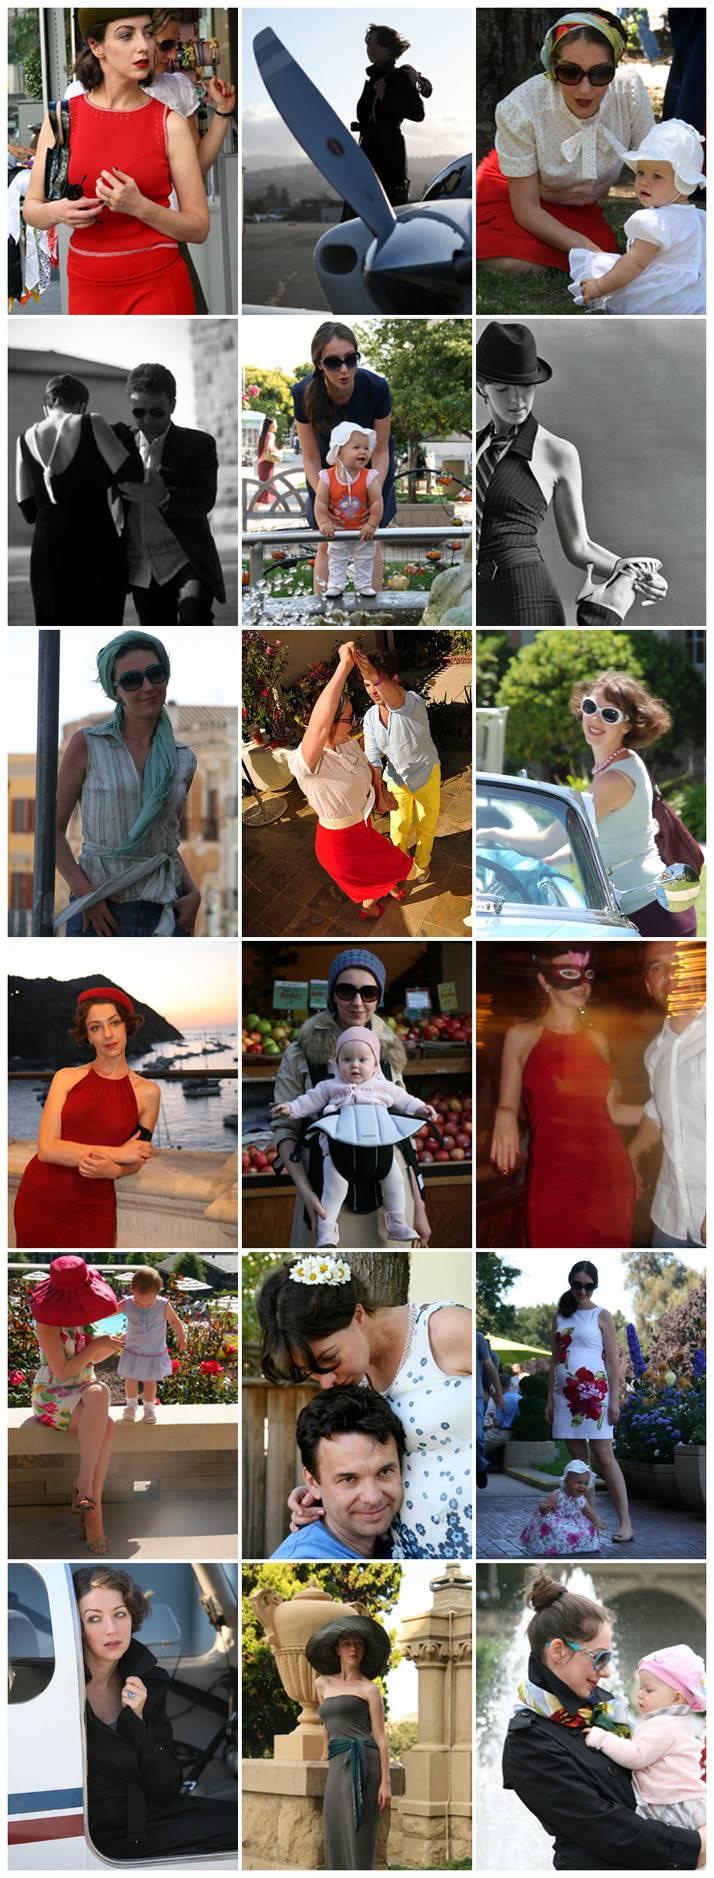 Тенденции 2013 года Lavrishina_blog_tutta_la_mia_vita_collage2